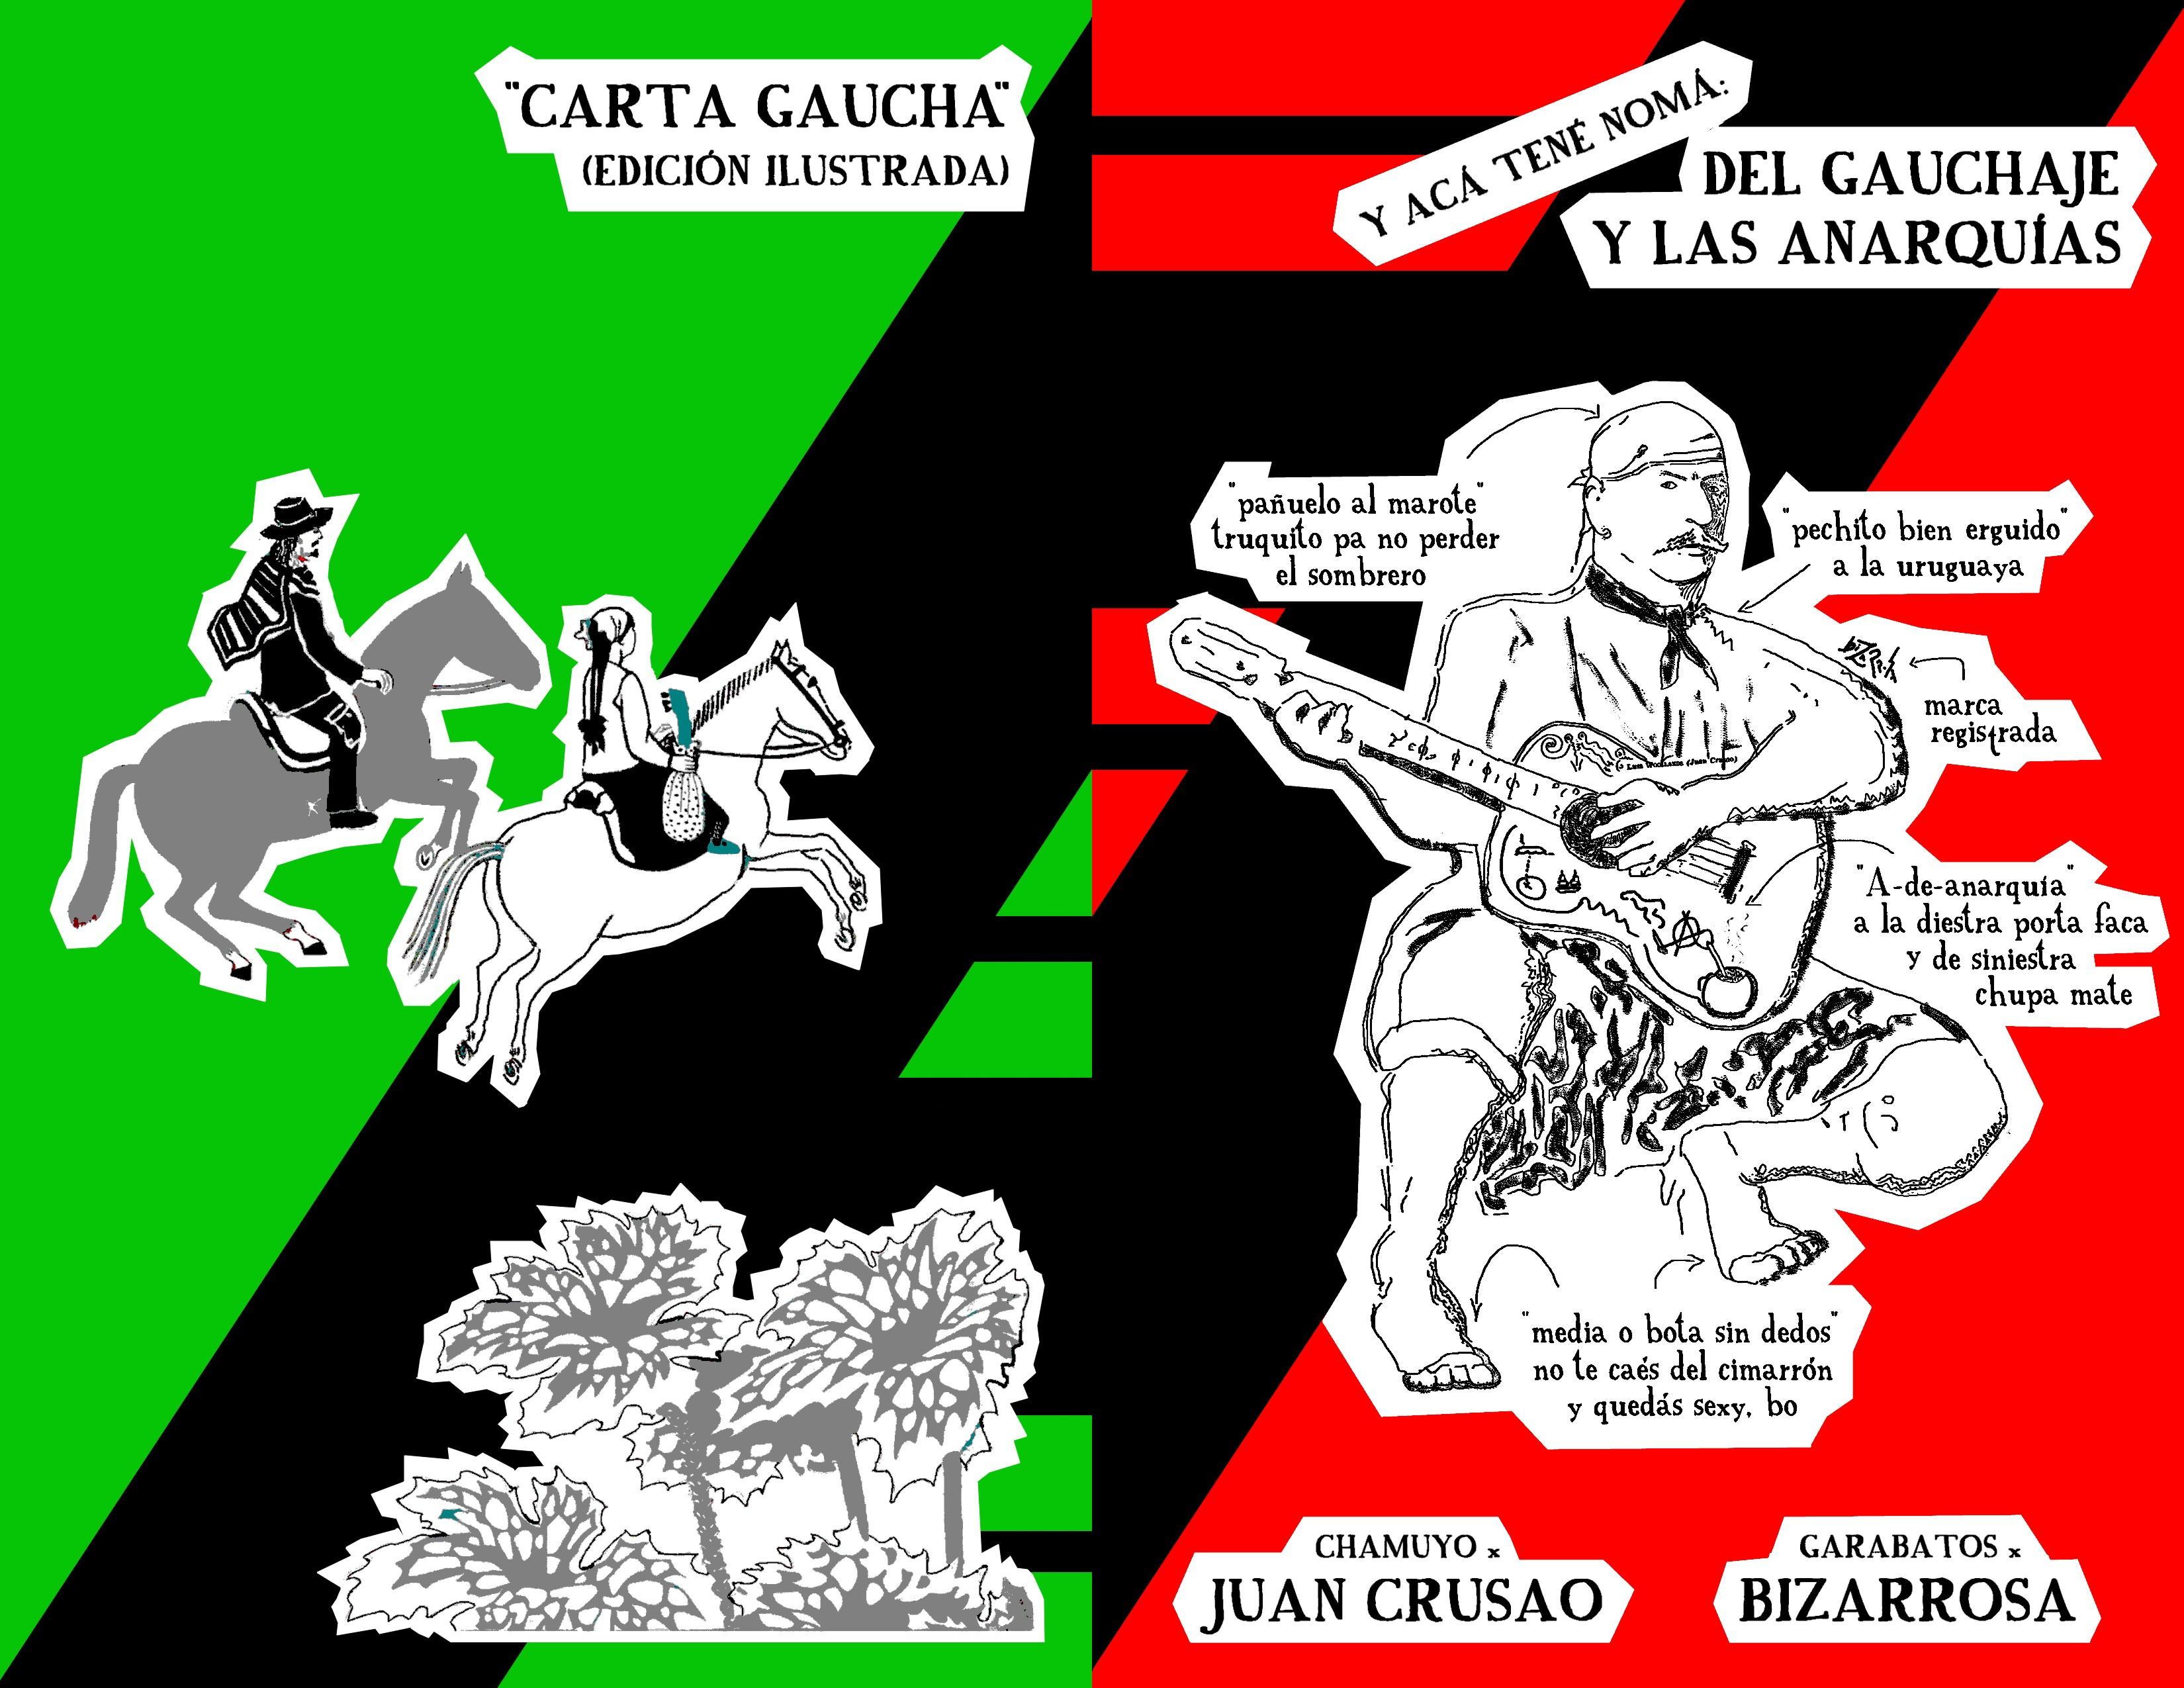 CARTA GAUCHA (ilustrated)